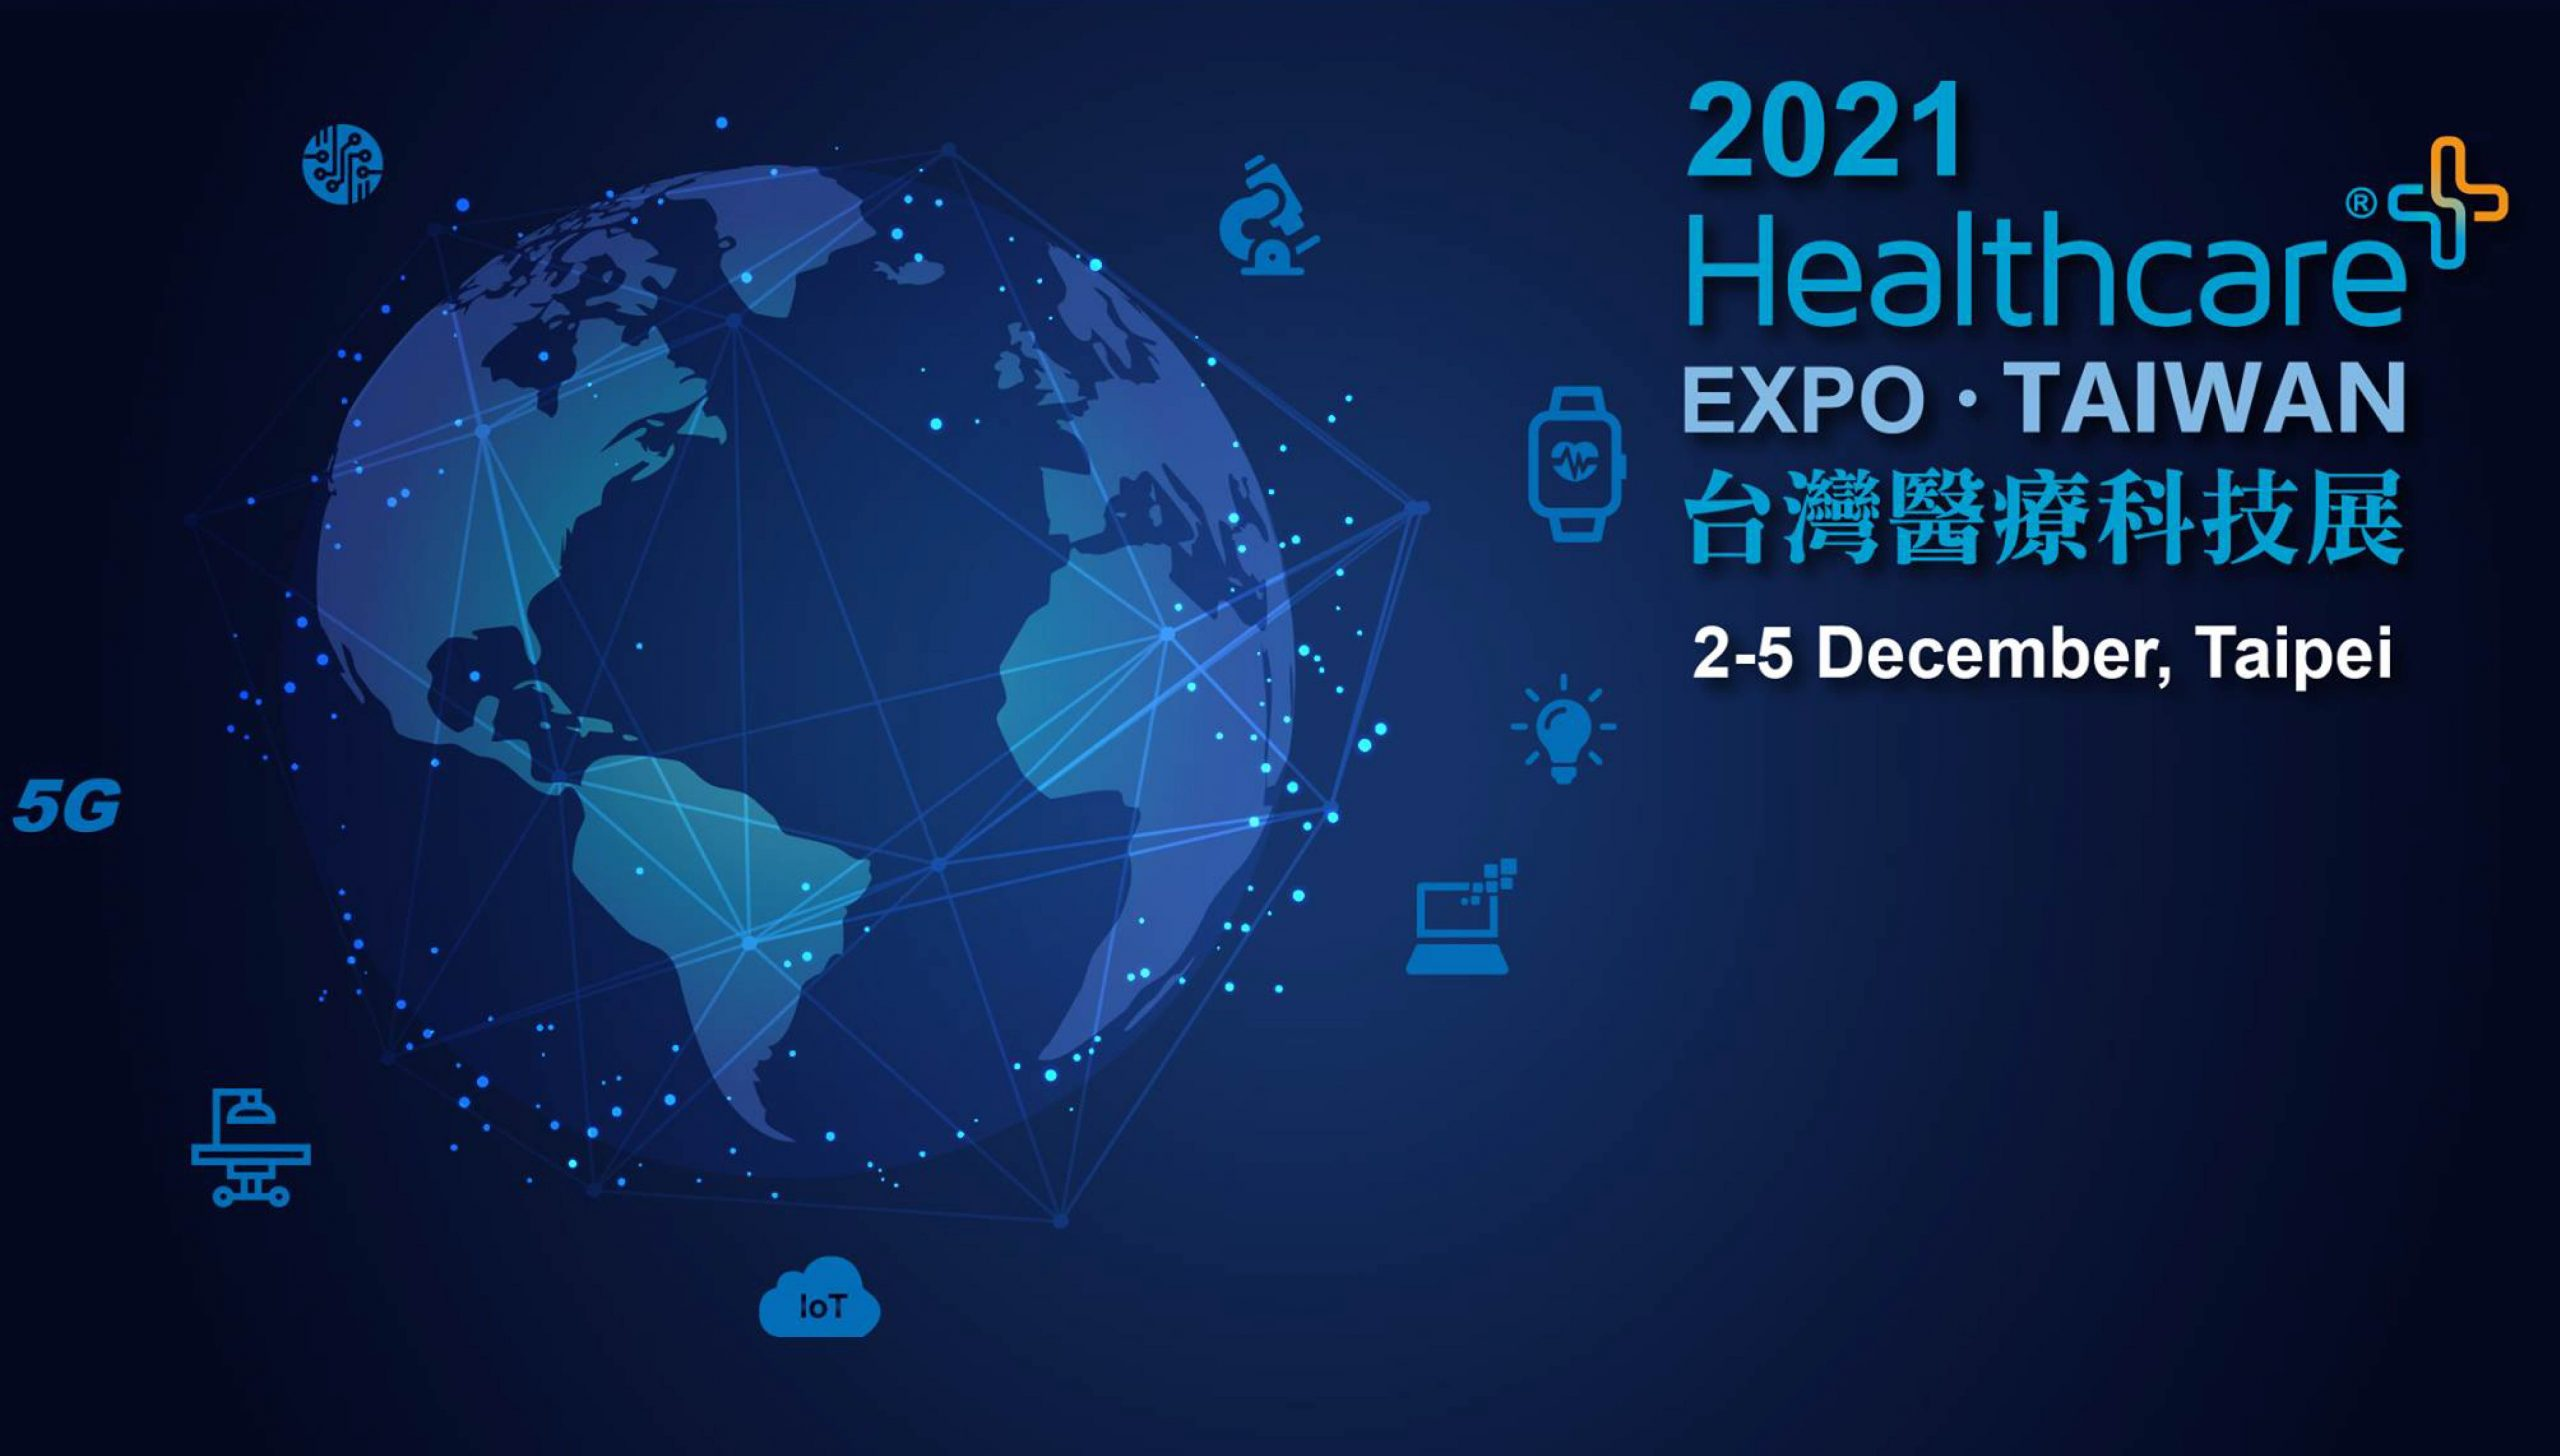 The Healthcare+ Expo